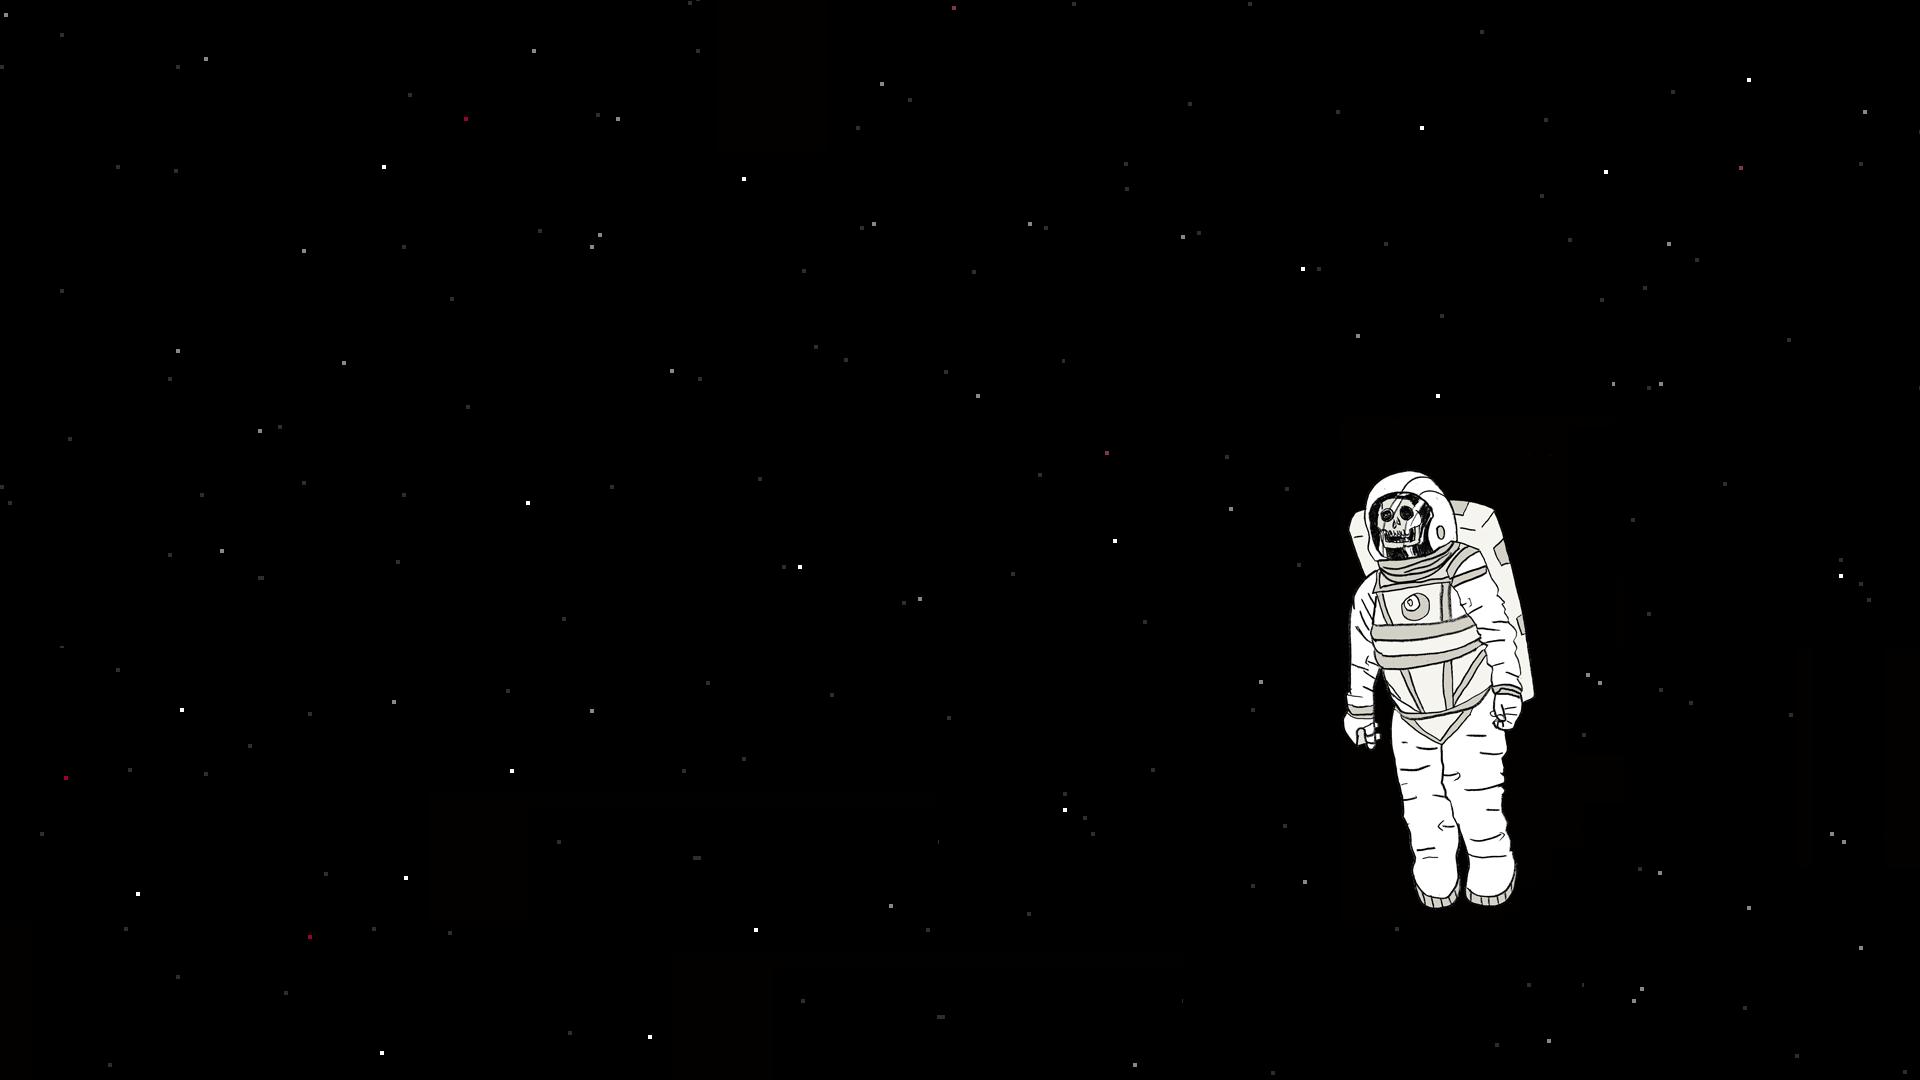 astronaut black background - photo #7